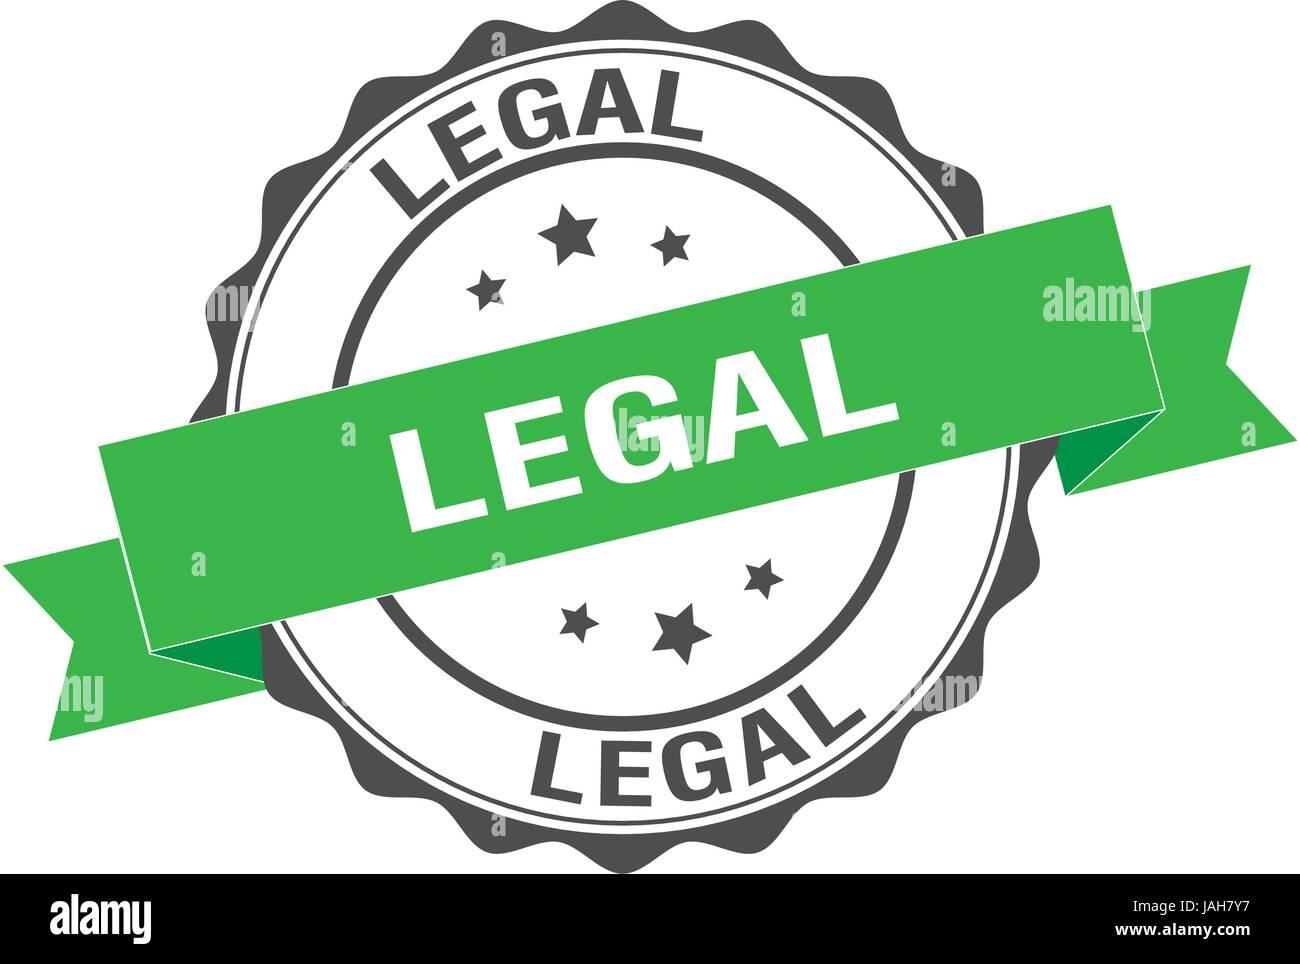 Legal stamp illustration - Stock Image